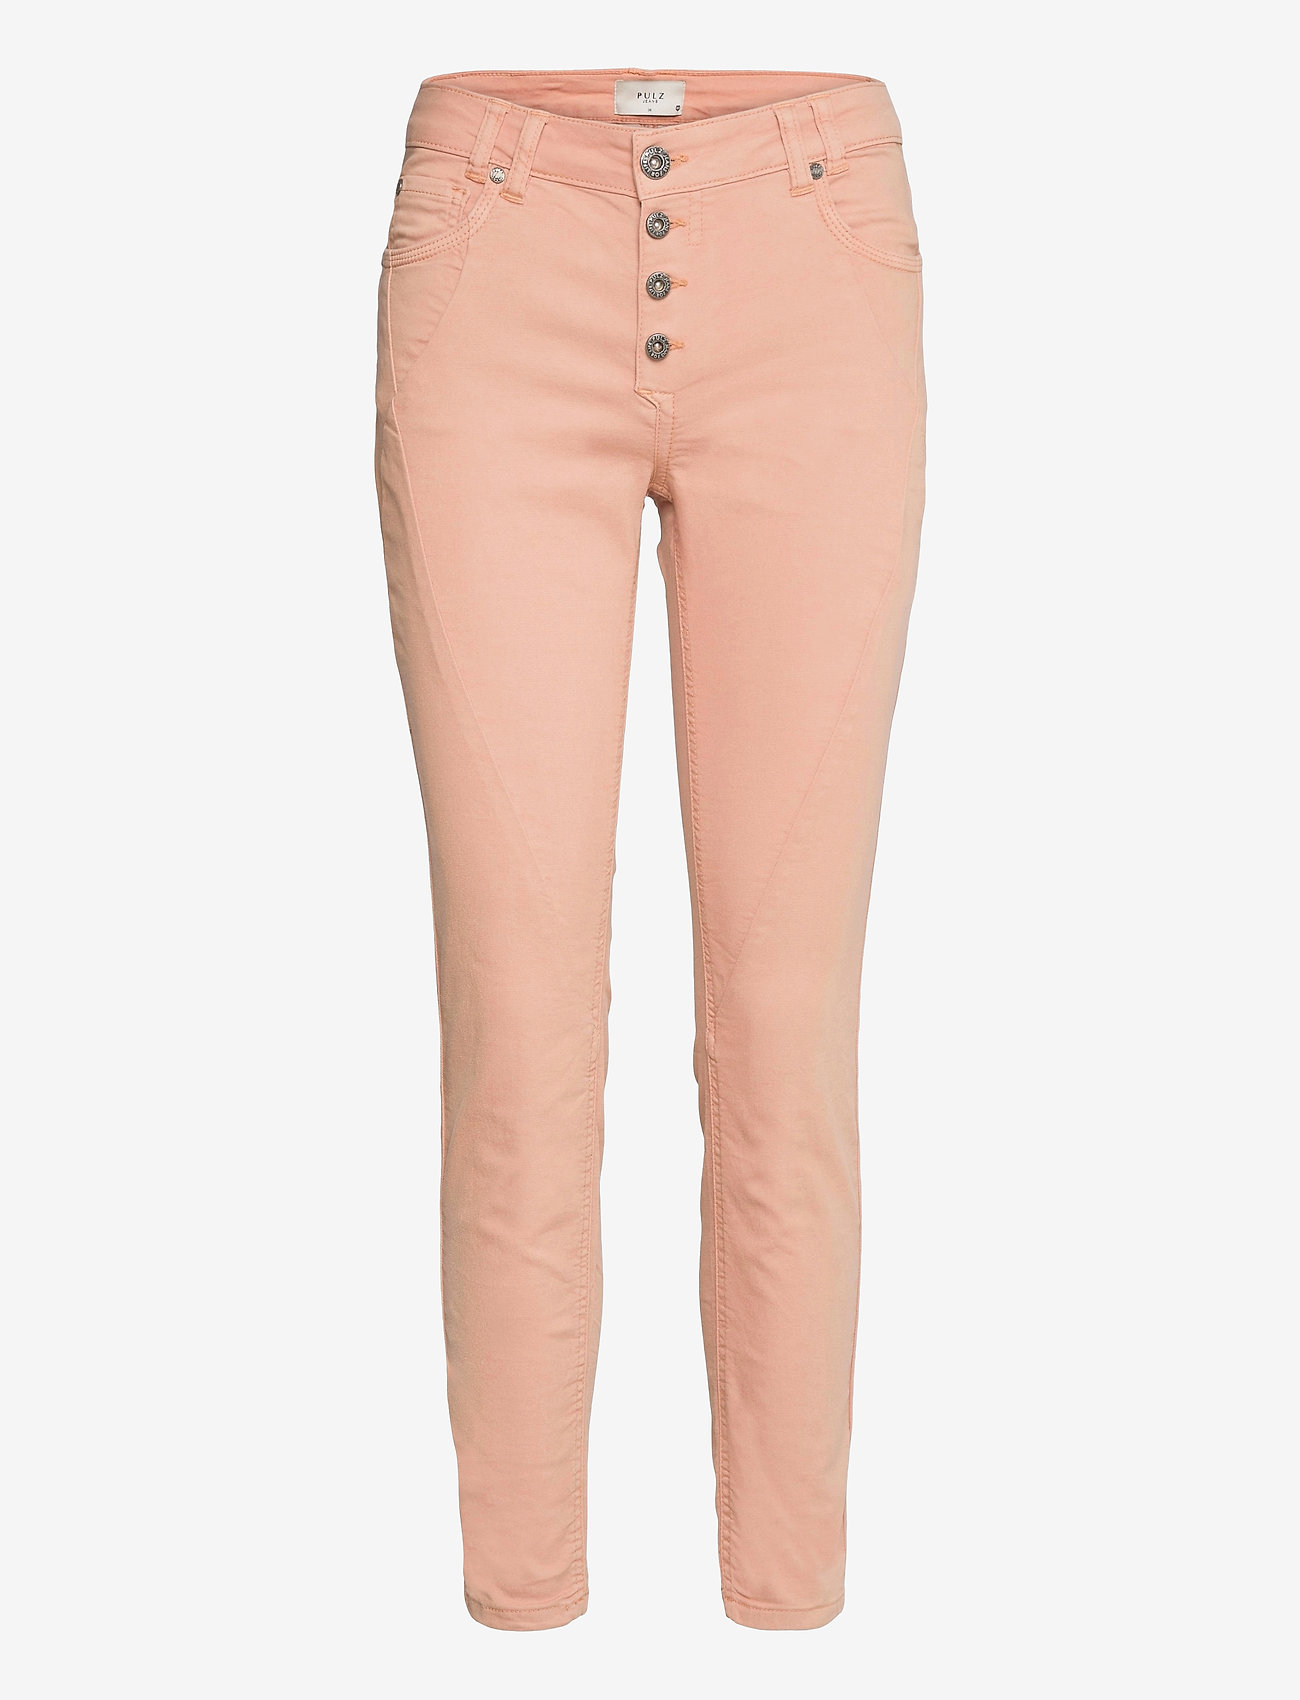 Pulz Jeans - PZROSITA PANT - skinny jeans - mahogany rose - 0